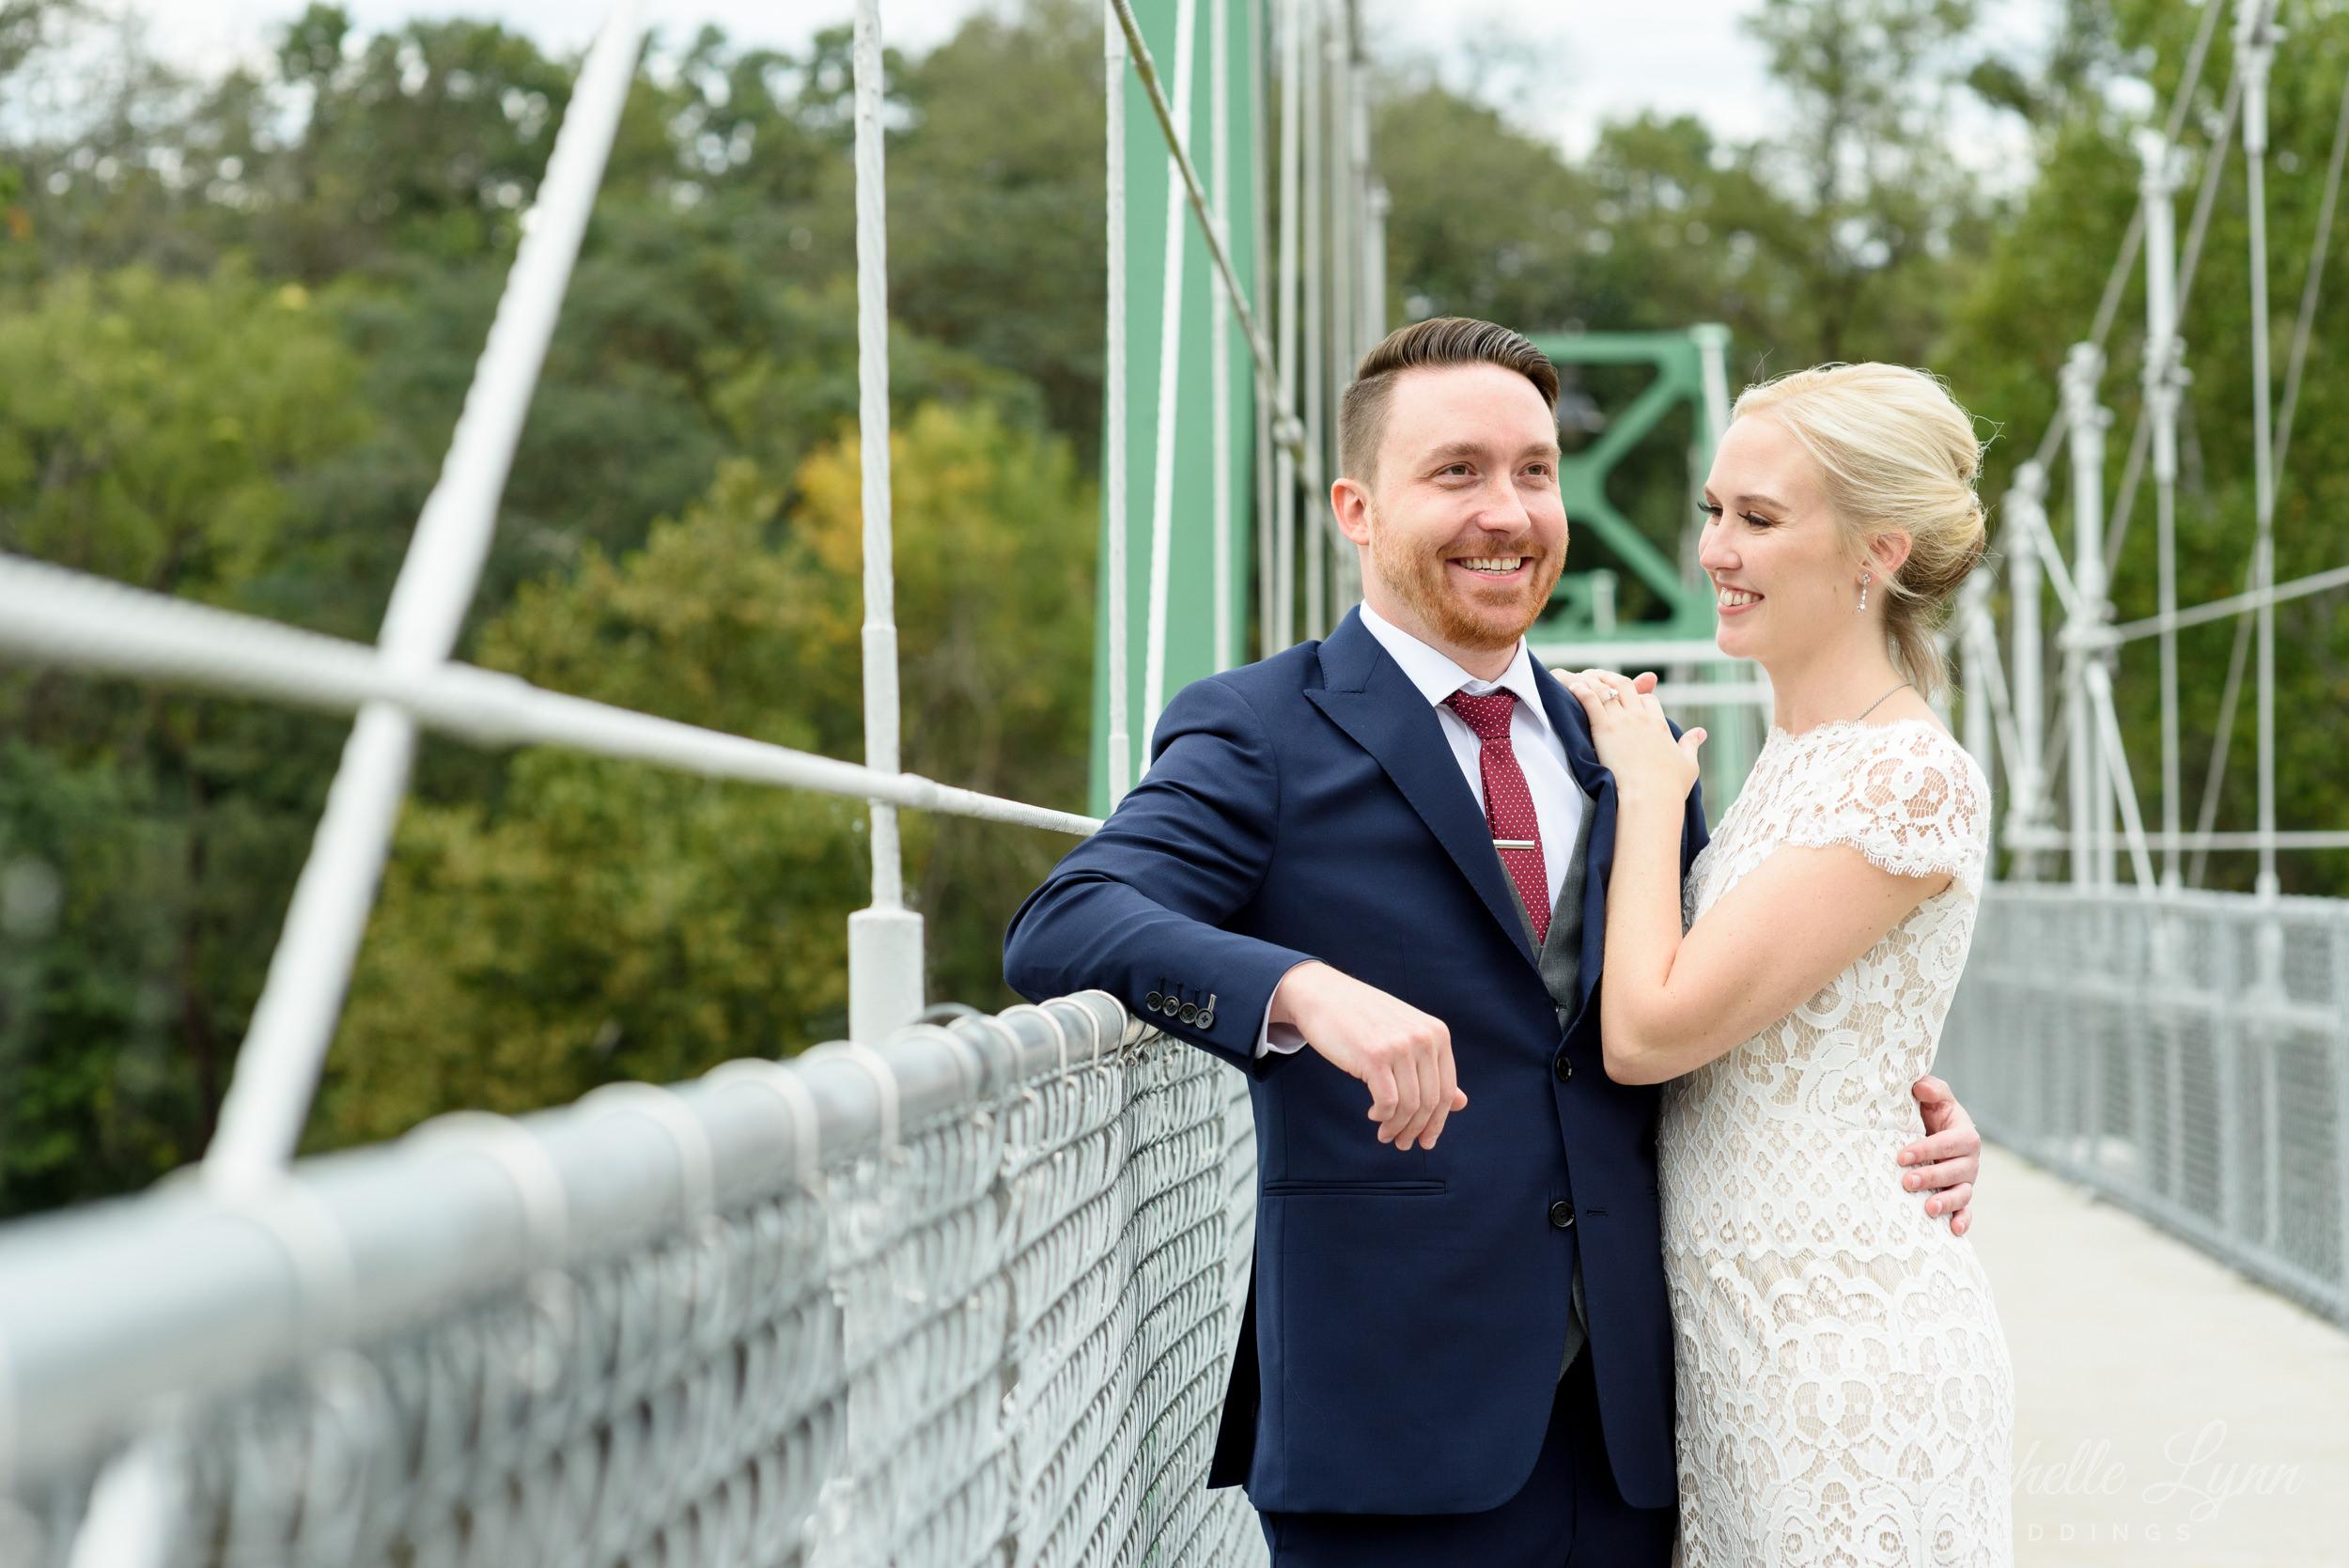 mlw-lumberville-general-store-new-hope-wedding-photographer-16.jpg